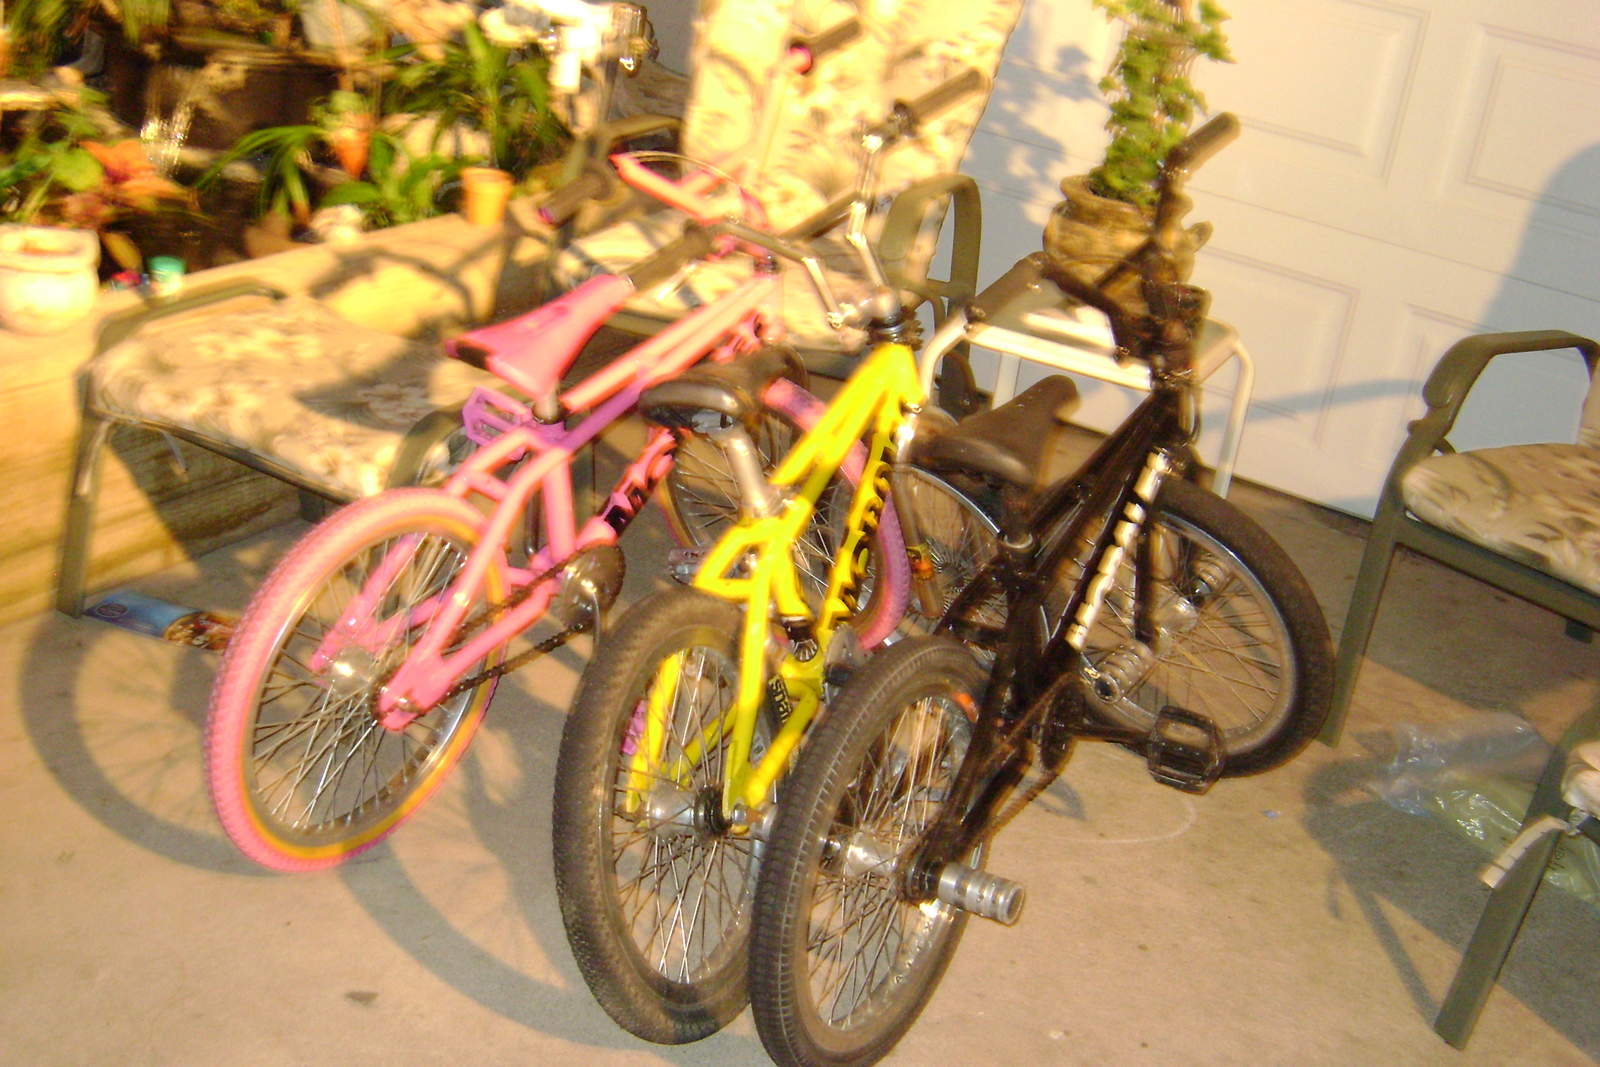 https://s3.amazonaws.com/uploads.bmxmuseum.com/user-images/6905/bikes-freestyle-0205968fa8c19.jpg